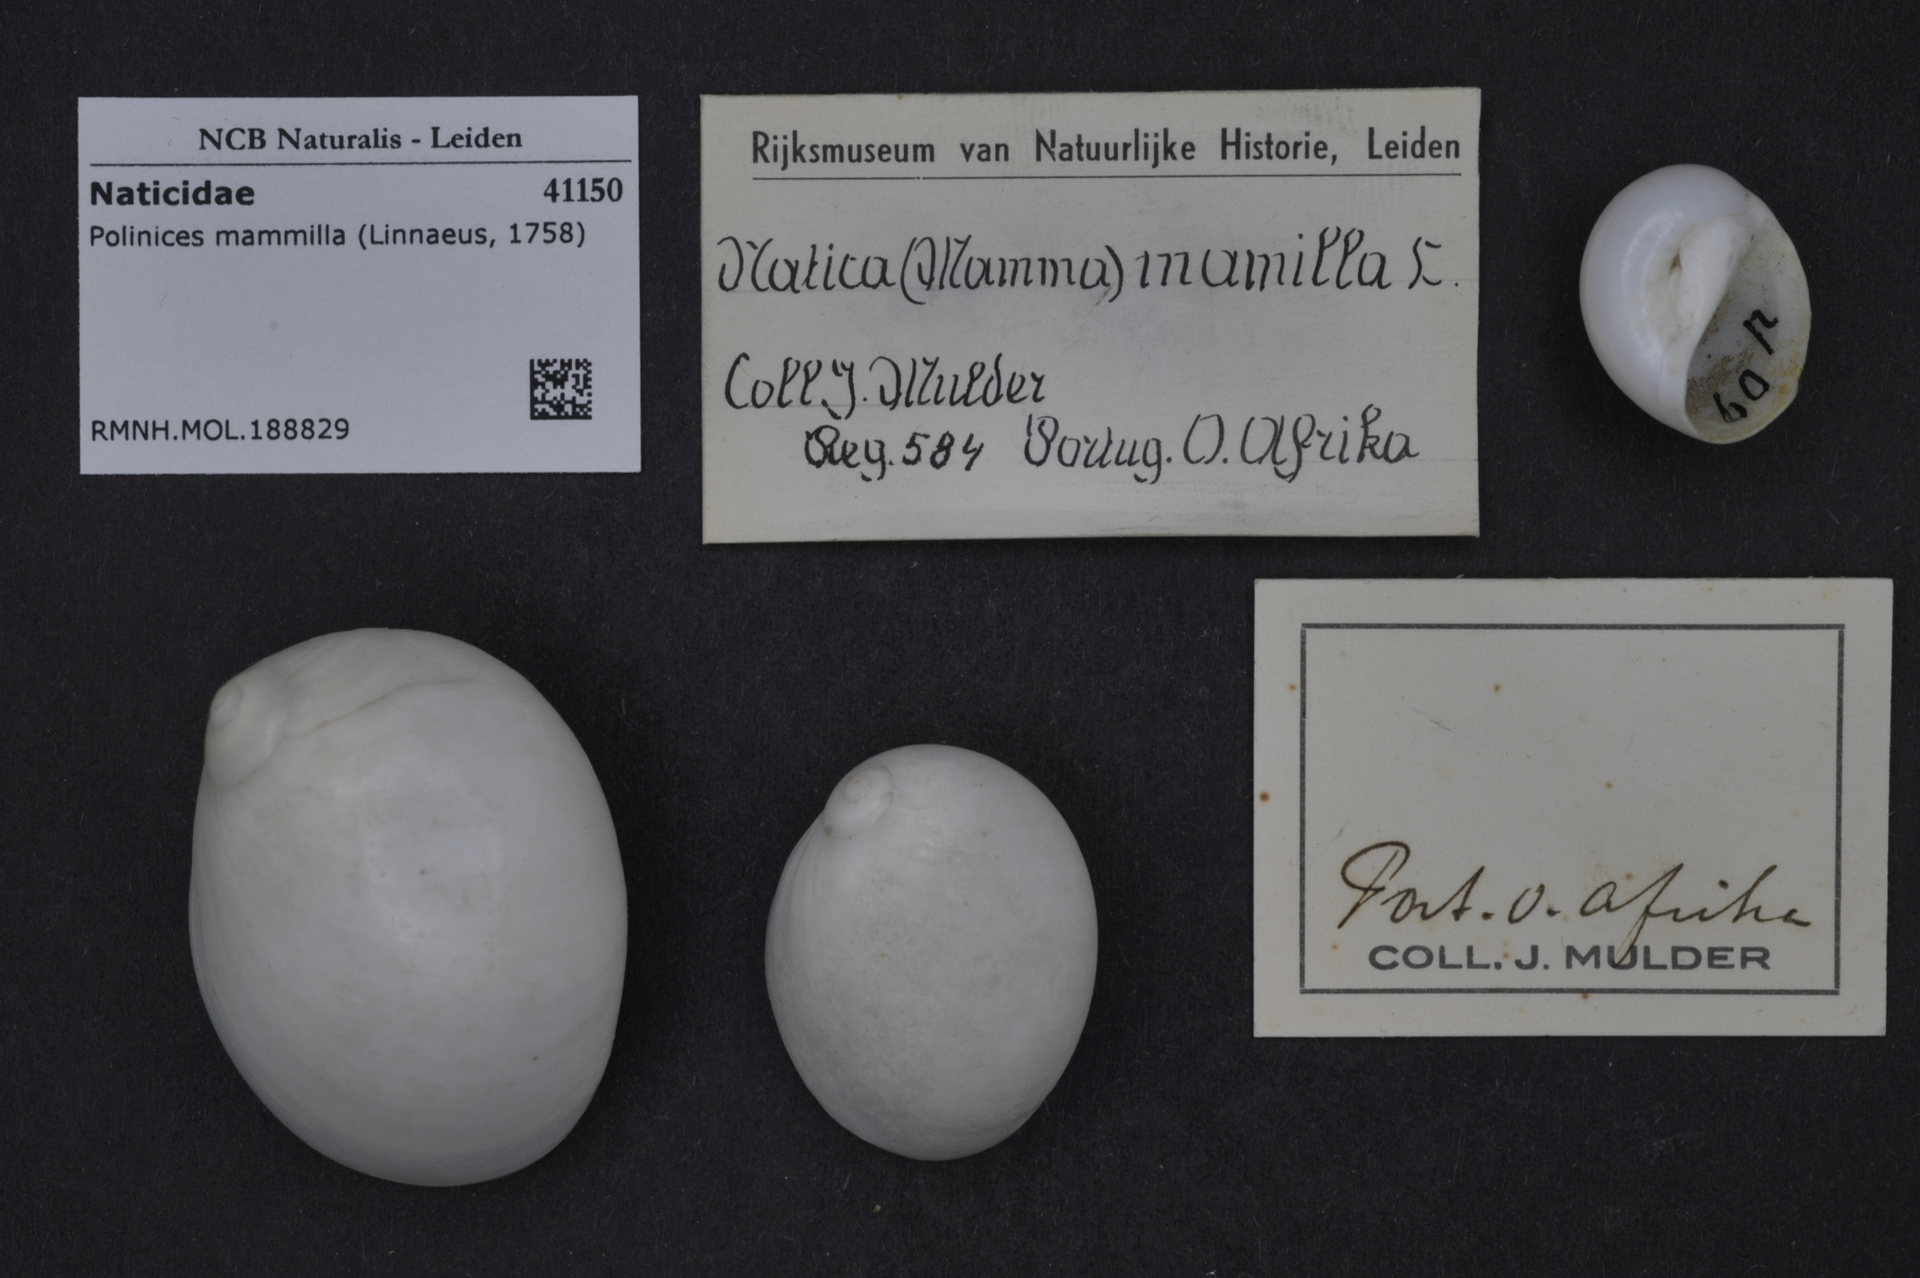 RMNH.MOL.188829 | Polinices mammilla (Linnaeus, 1758)